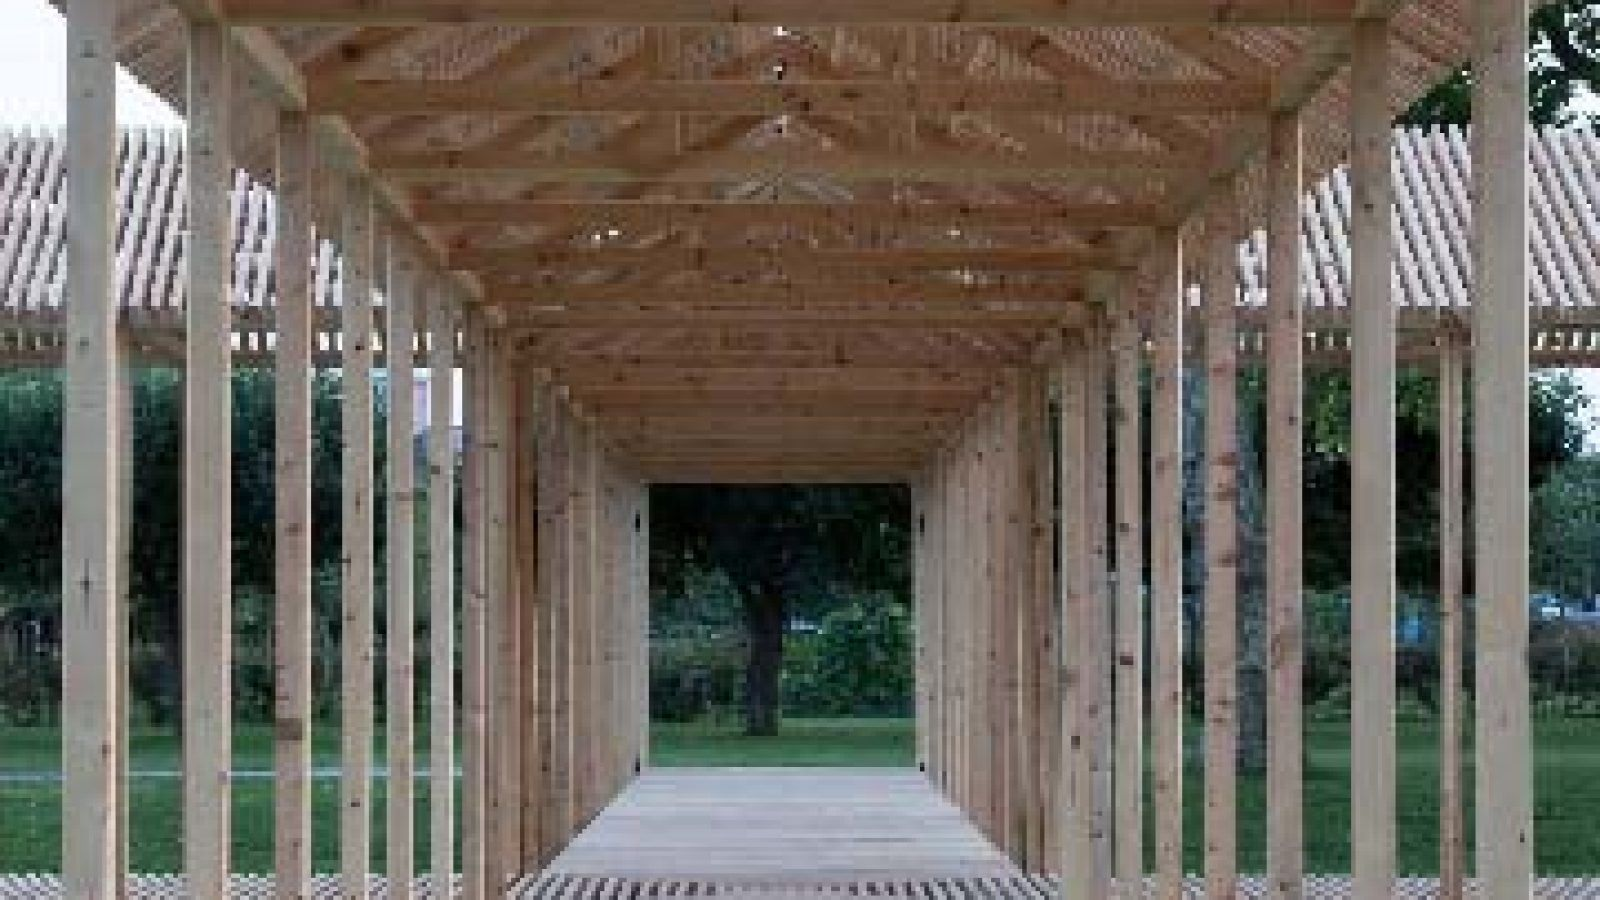 Temporary Allé Pavilion, Royal Garden, designed by Krupinski/Krupinska Arkitekter, Stockholm and Per Olsen, Arkitekt m.a.a., Copenhagen; Foto: Hampus Berndtson